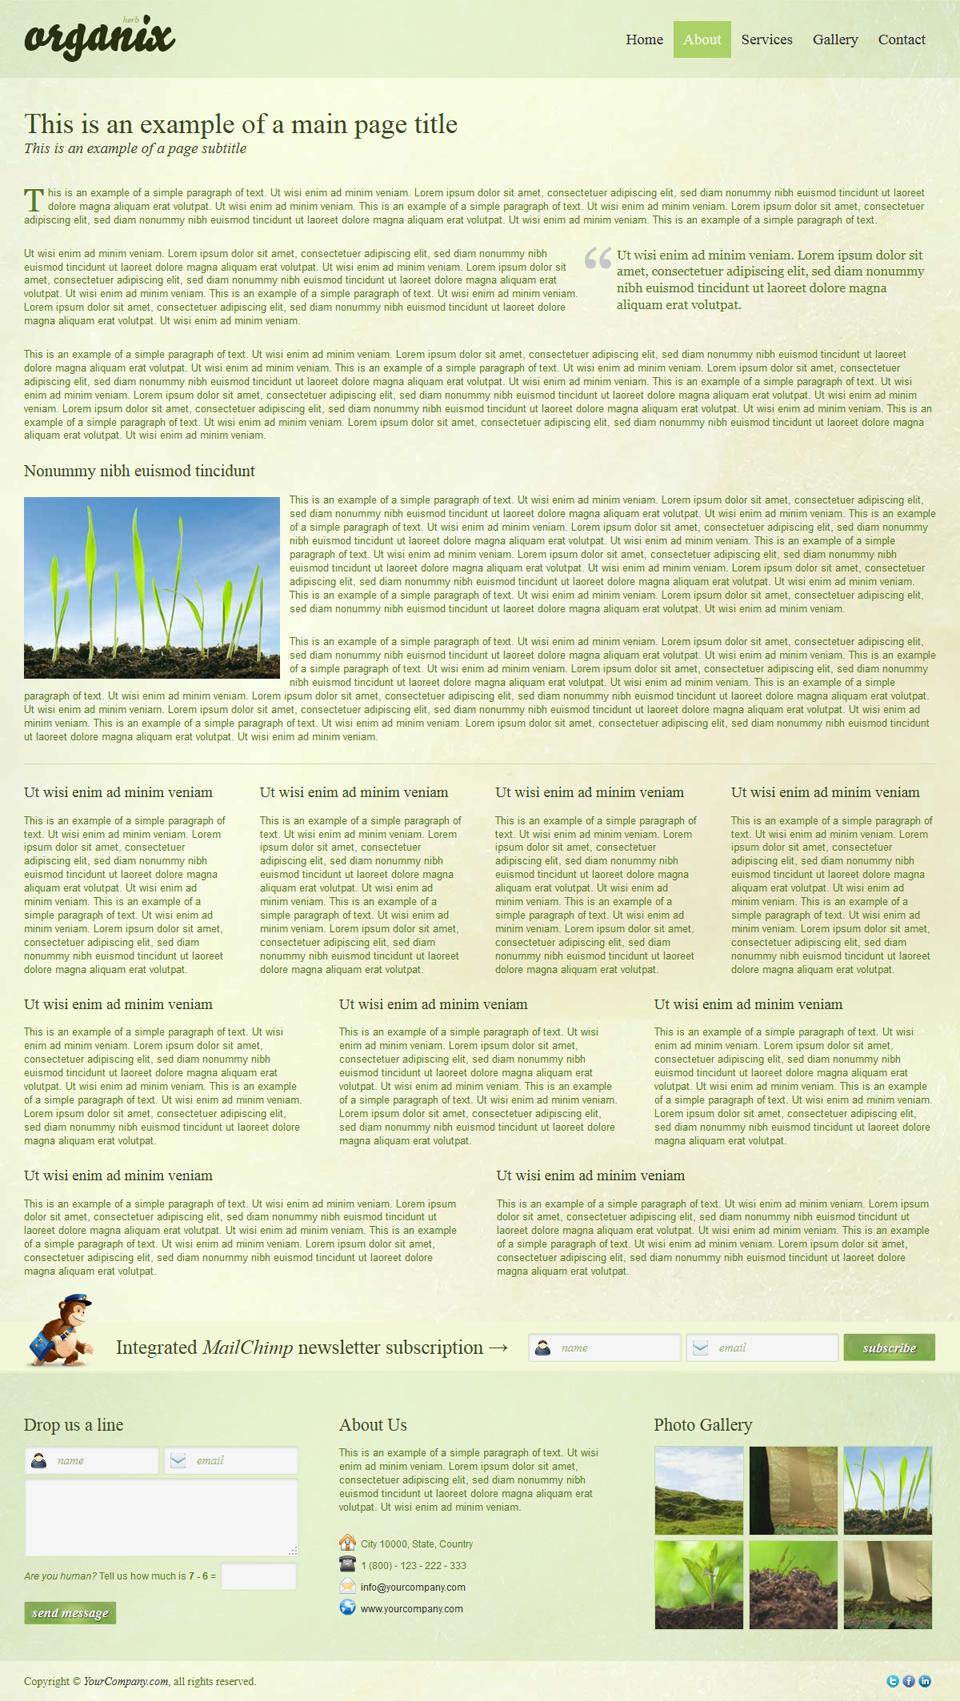 Organix - Simple Product Oriented Landing Page - Organix - Herb Inner Page